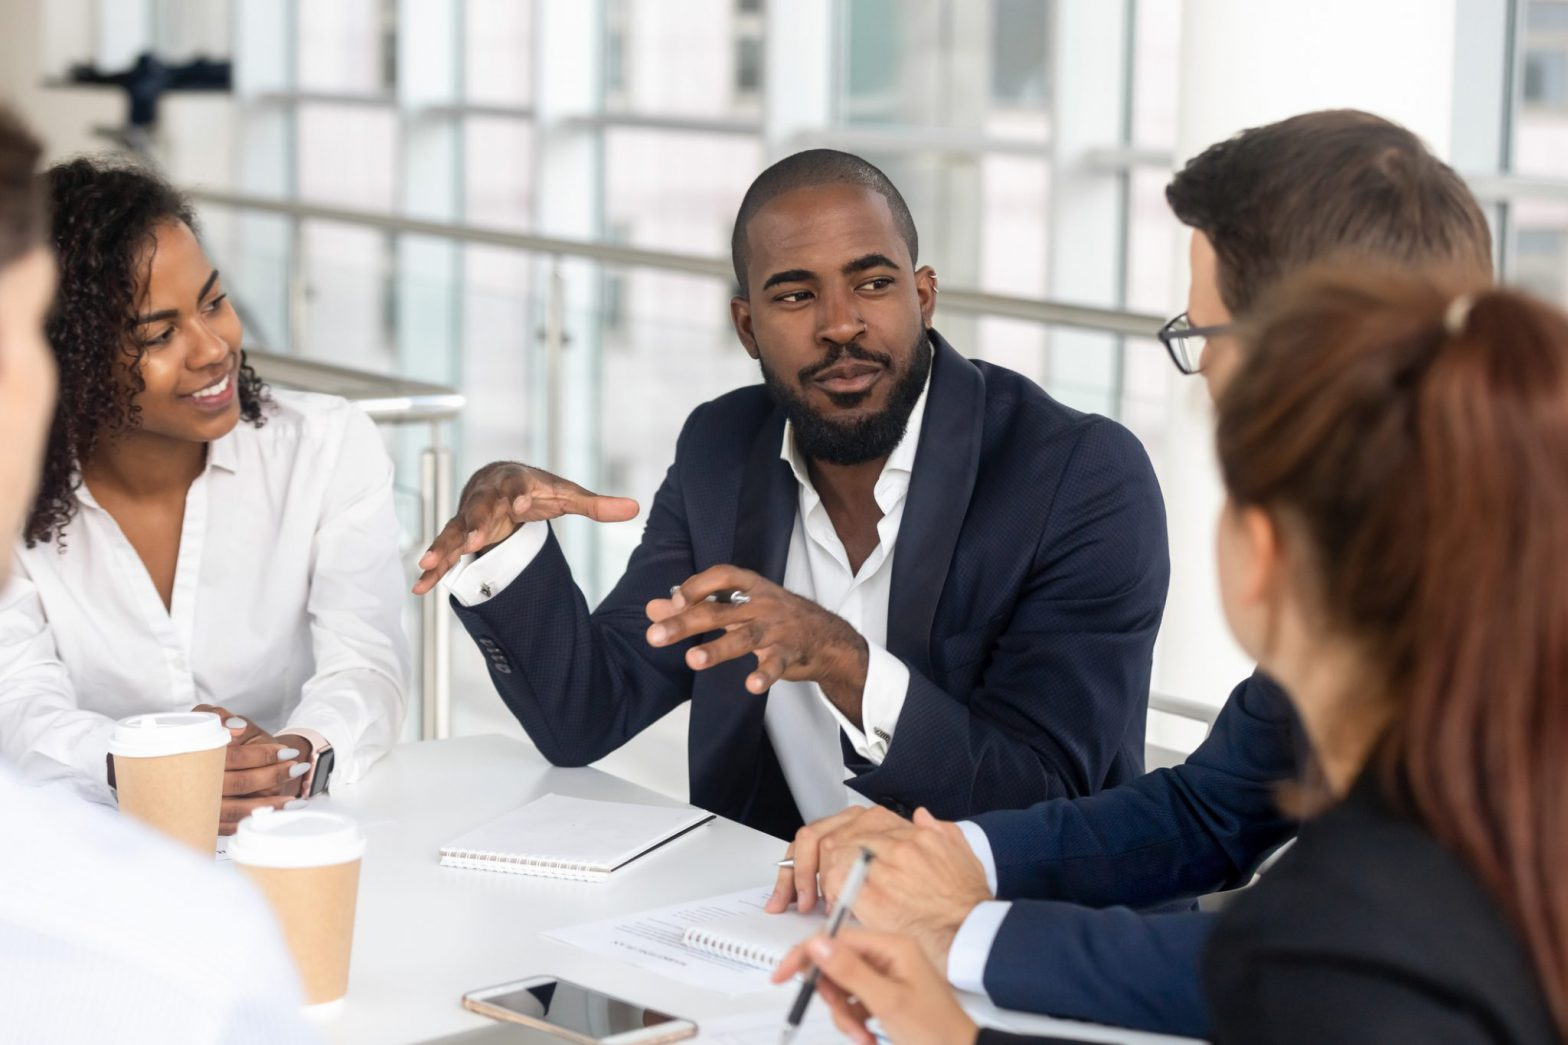 Leadership Everywhere: Start Taking Initiative Now